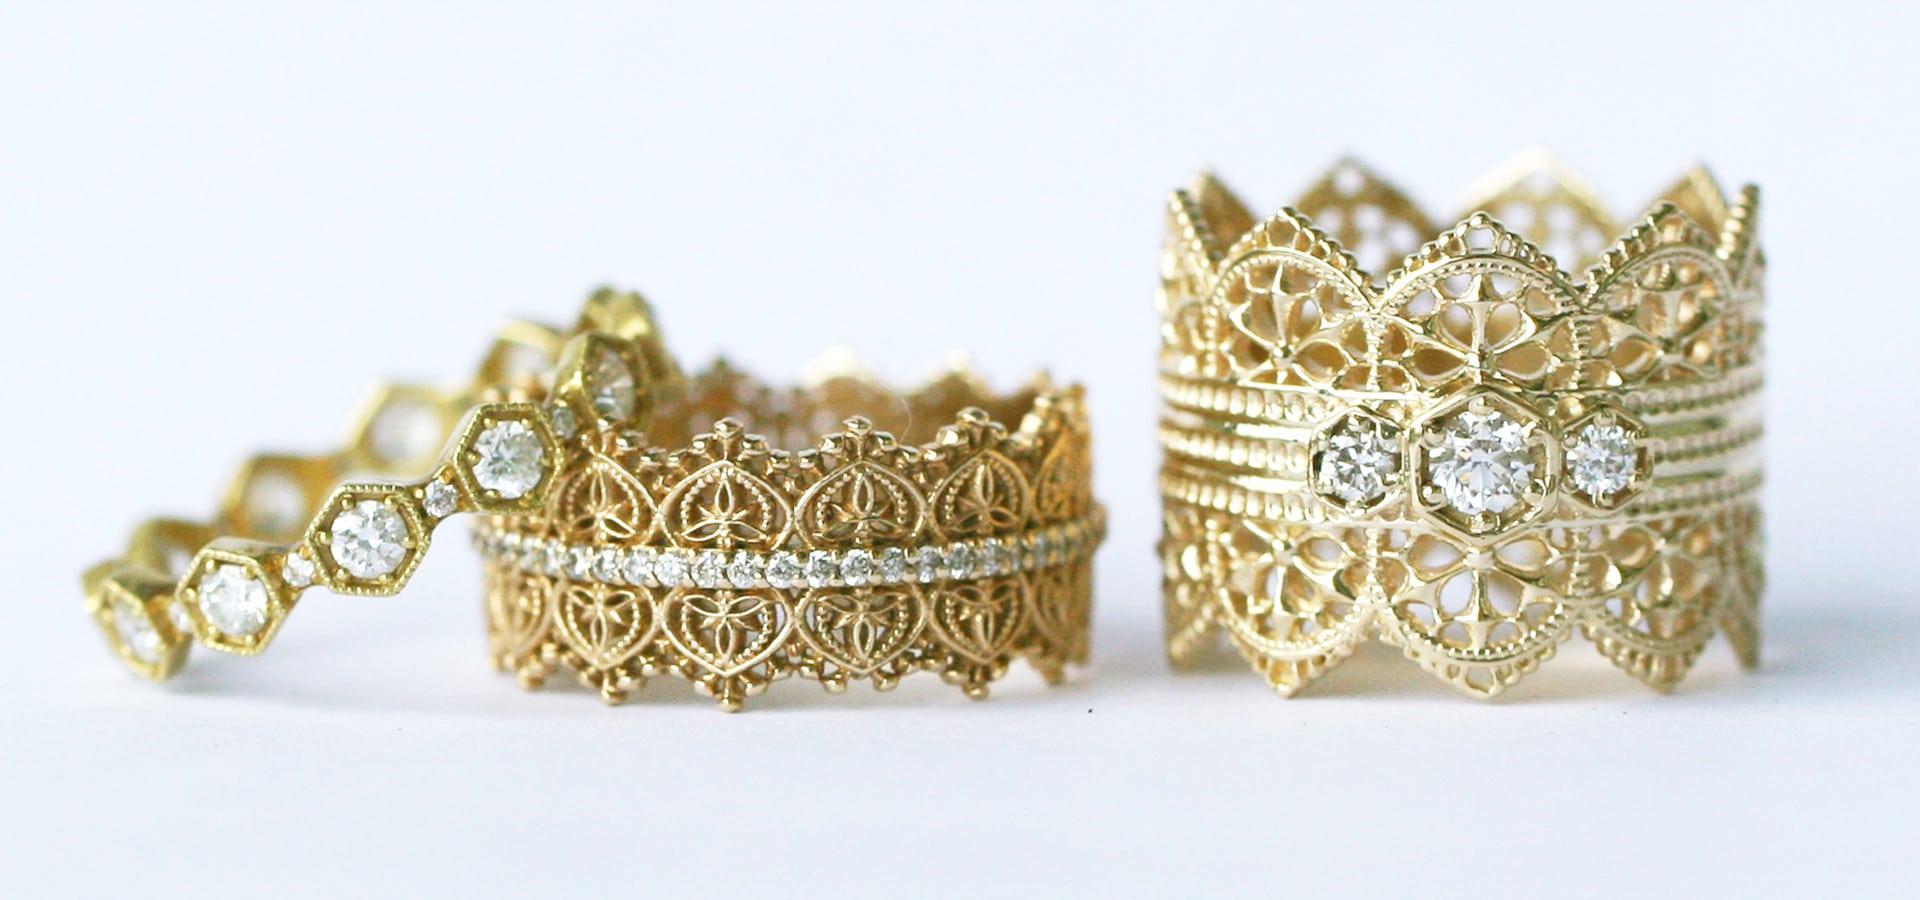 Diamond jewelry image